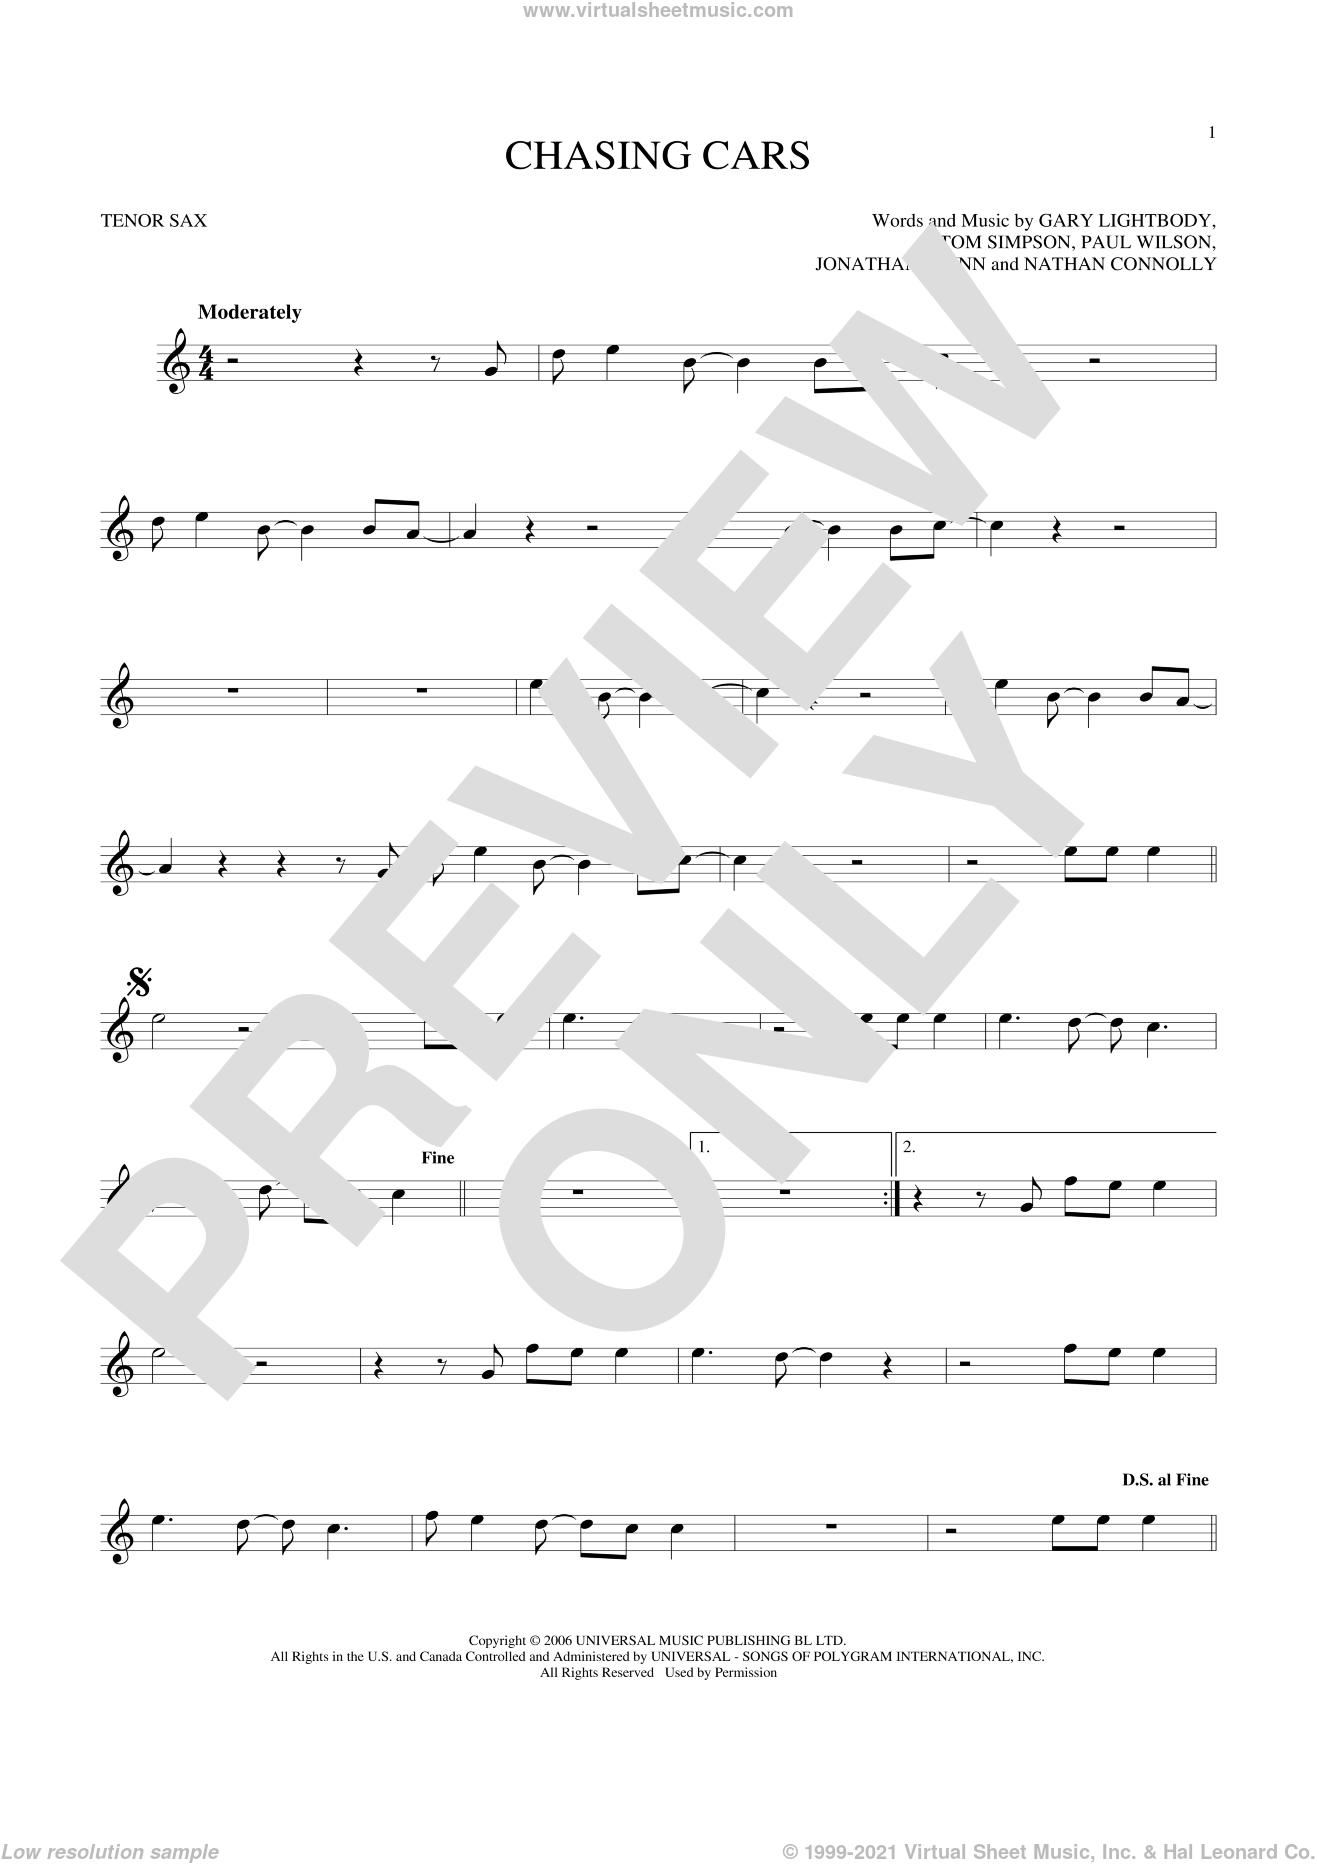 Chasing Cars sheet music for tenor saxophone solo by Snow Patrol, Gary Lightbody, Jonathan Quinn, Nathan Connolly, Paul Wilson and Tom Simpson, intermediate skill level